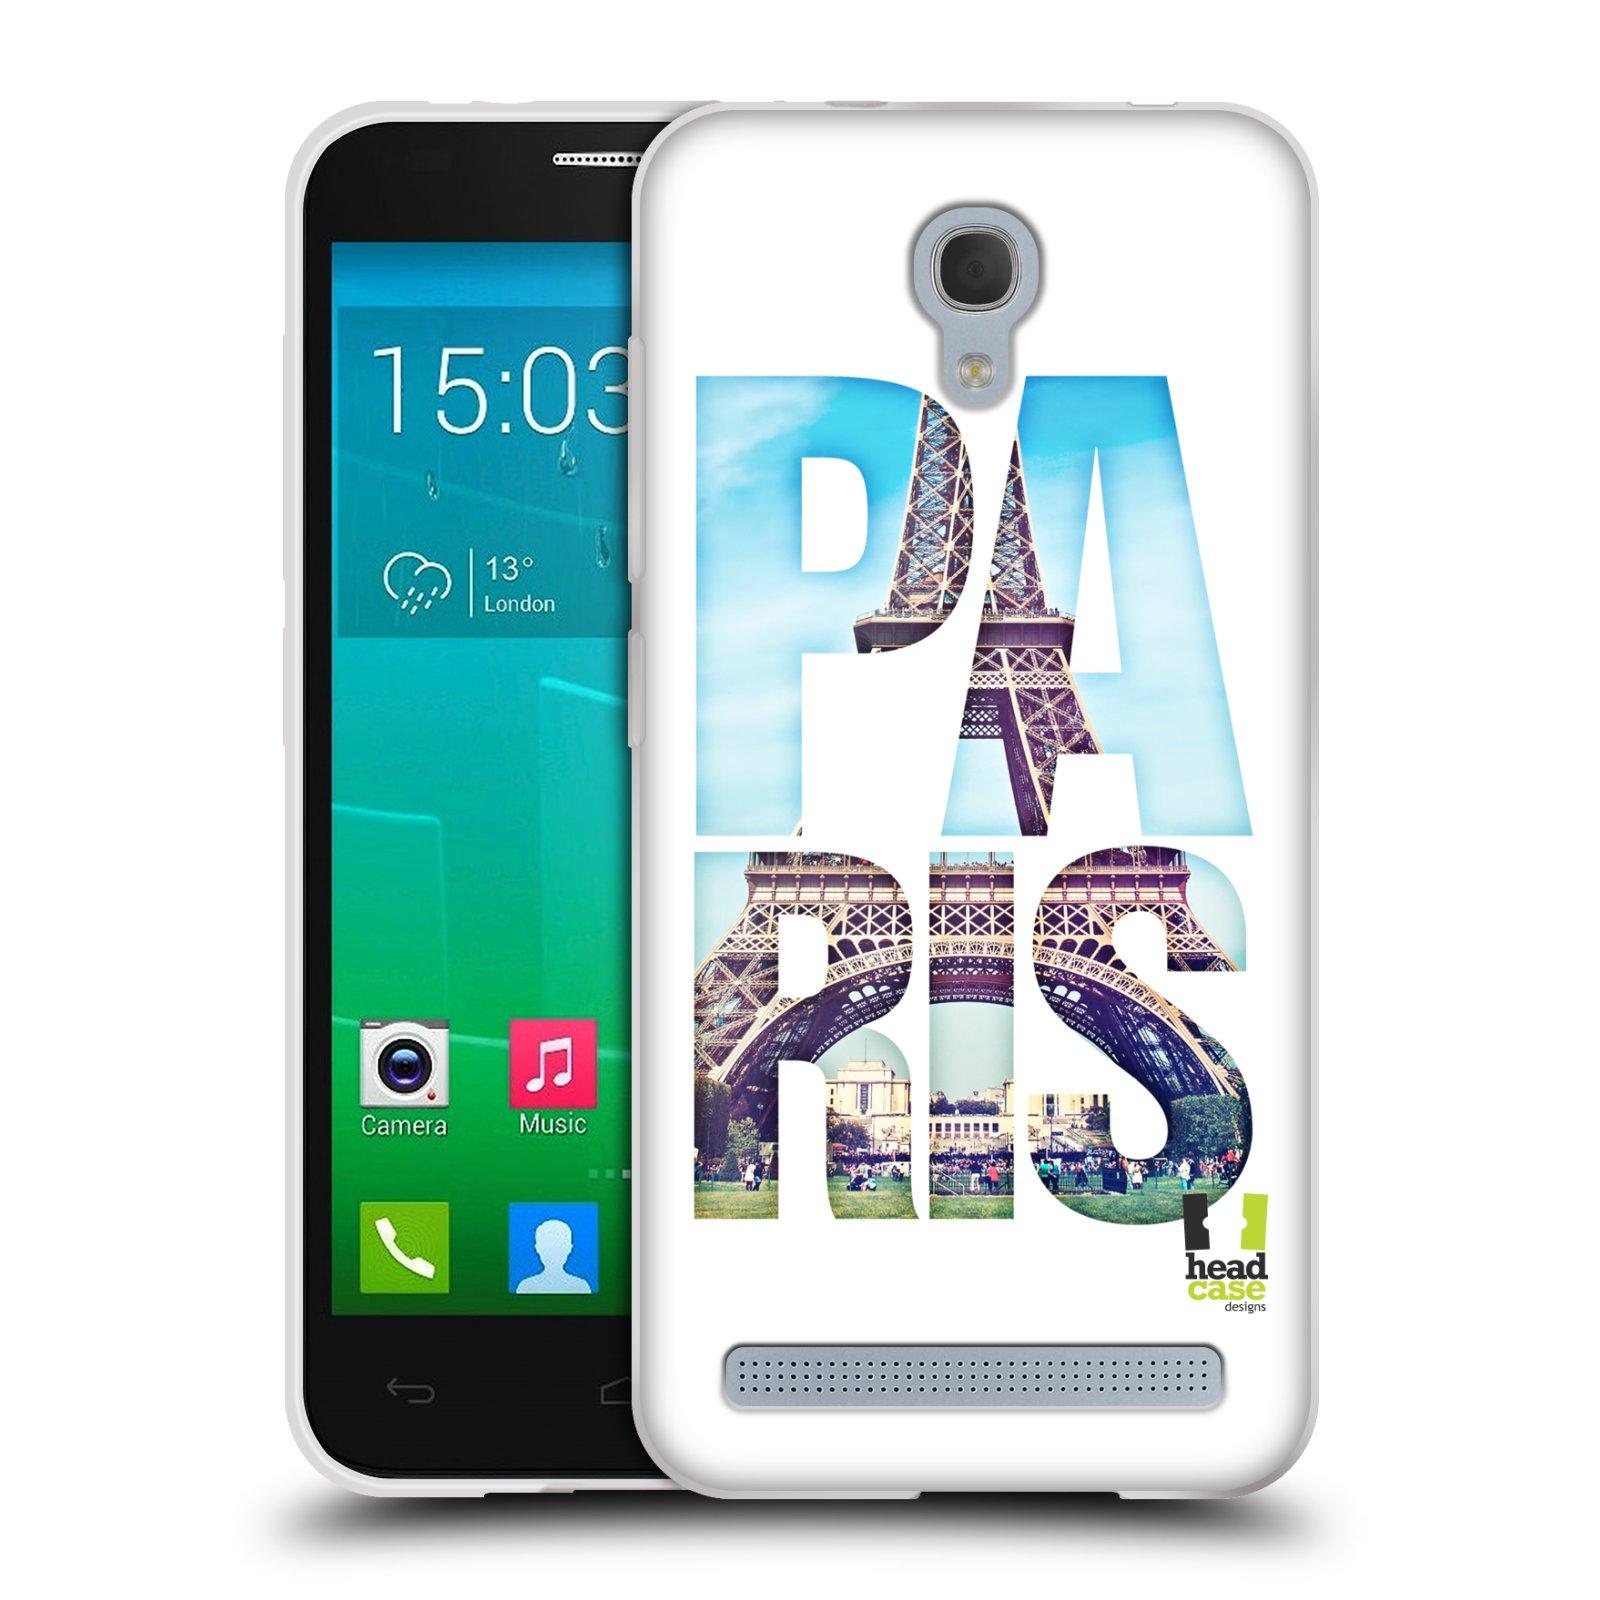 HEAD CASE silikonový obal na mobil Alcatel Idol 2 MINI S 6036Y vzor Města foto a nadpis FRANCIE, PAŘÍŽ, EIFFELOVA VĚŽ